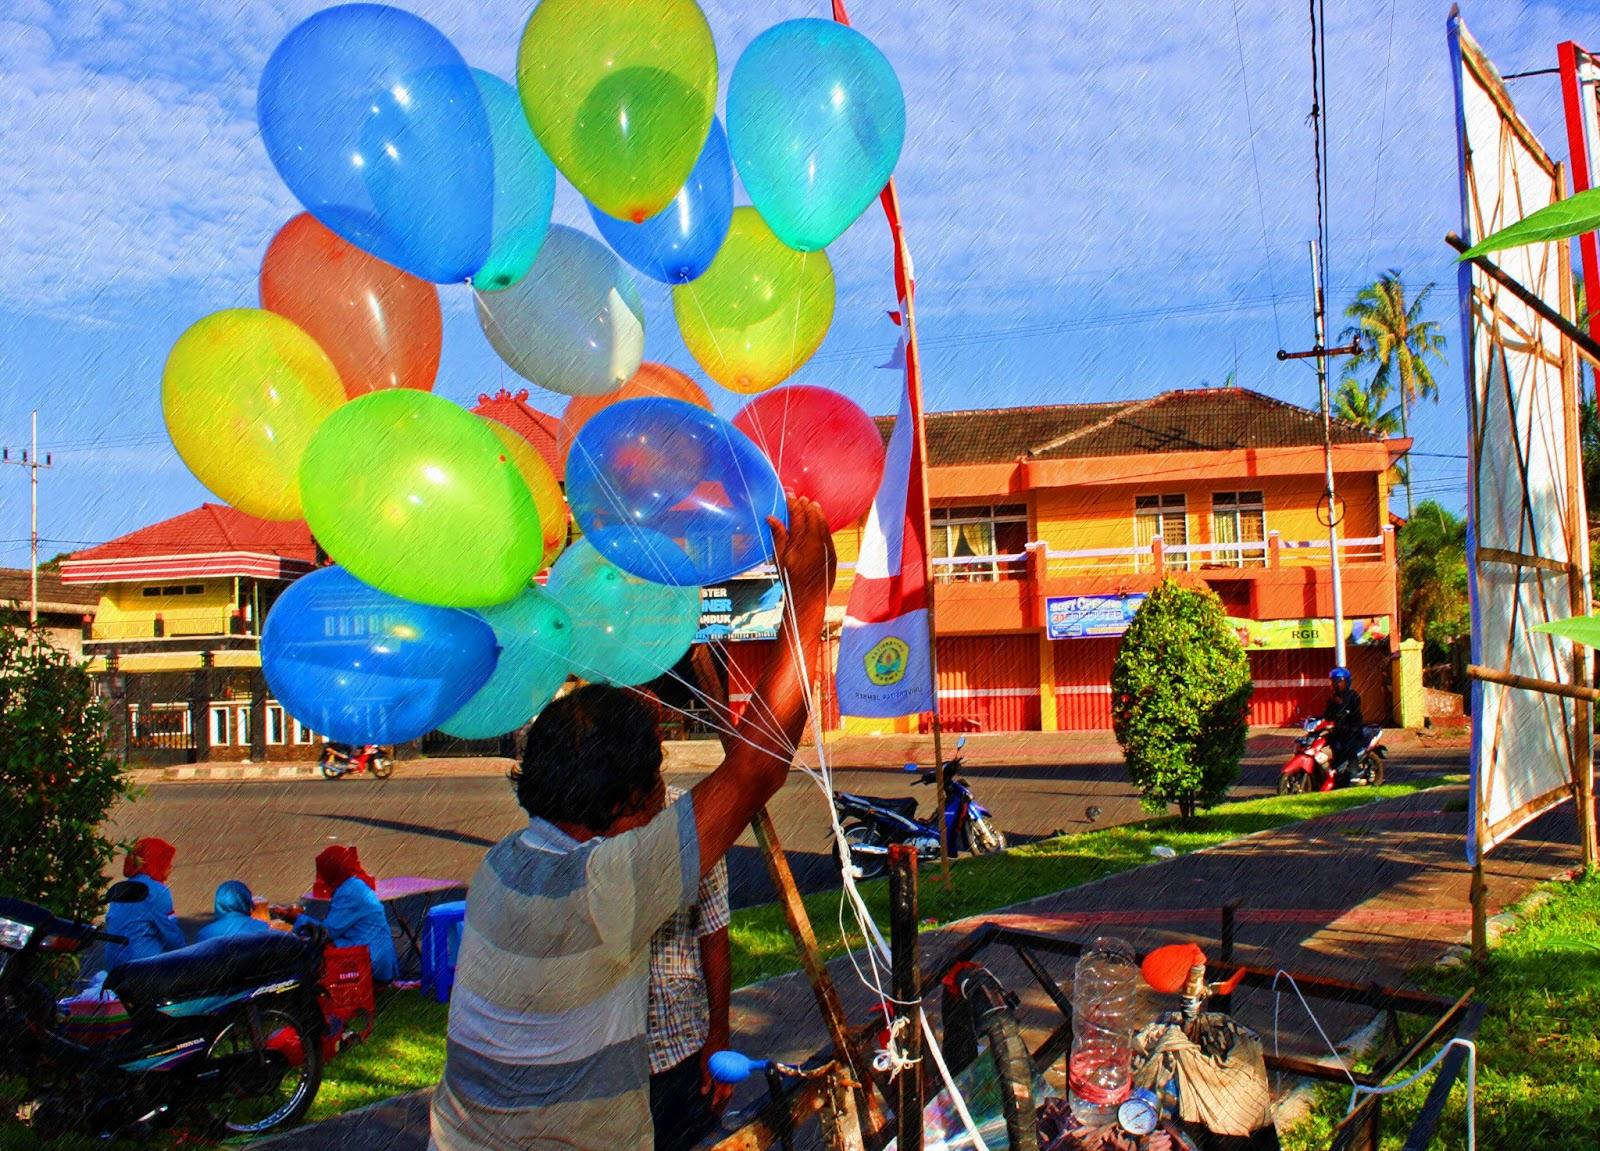 Widodo Van Sodhunk Unej Dan Warna Warni Balon Cerita Di Balik Mainan